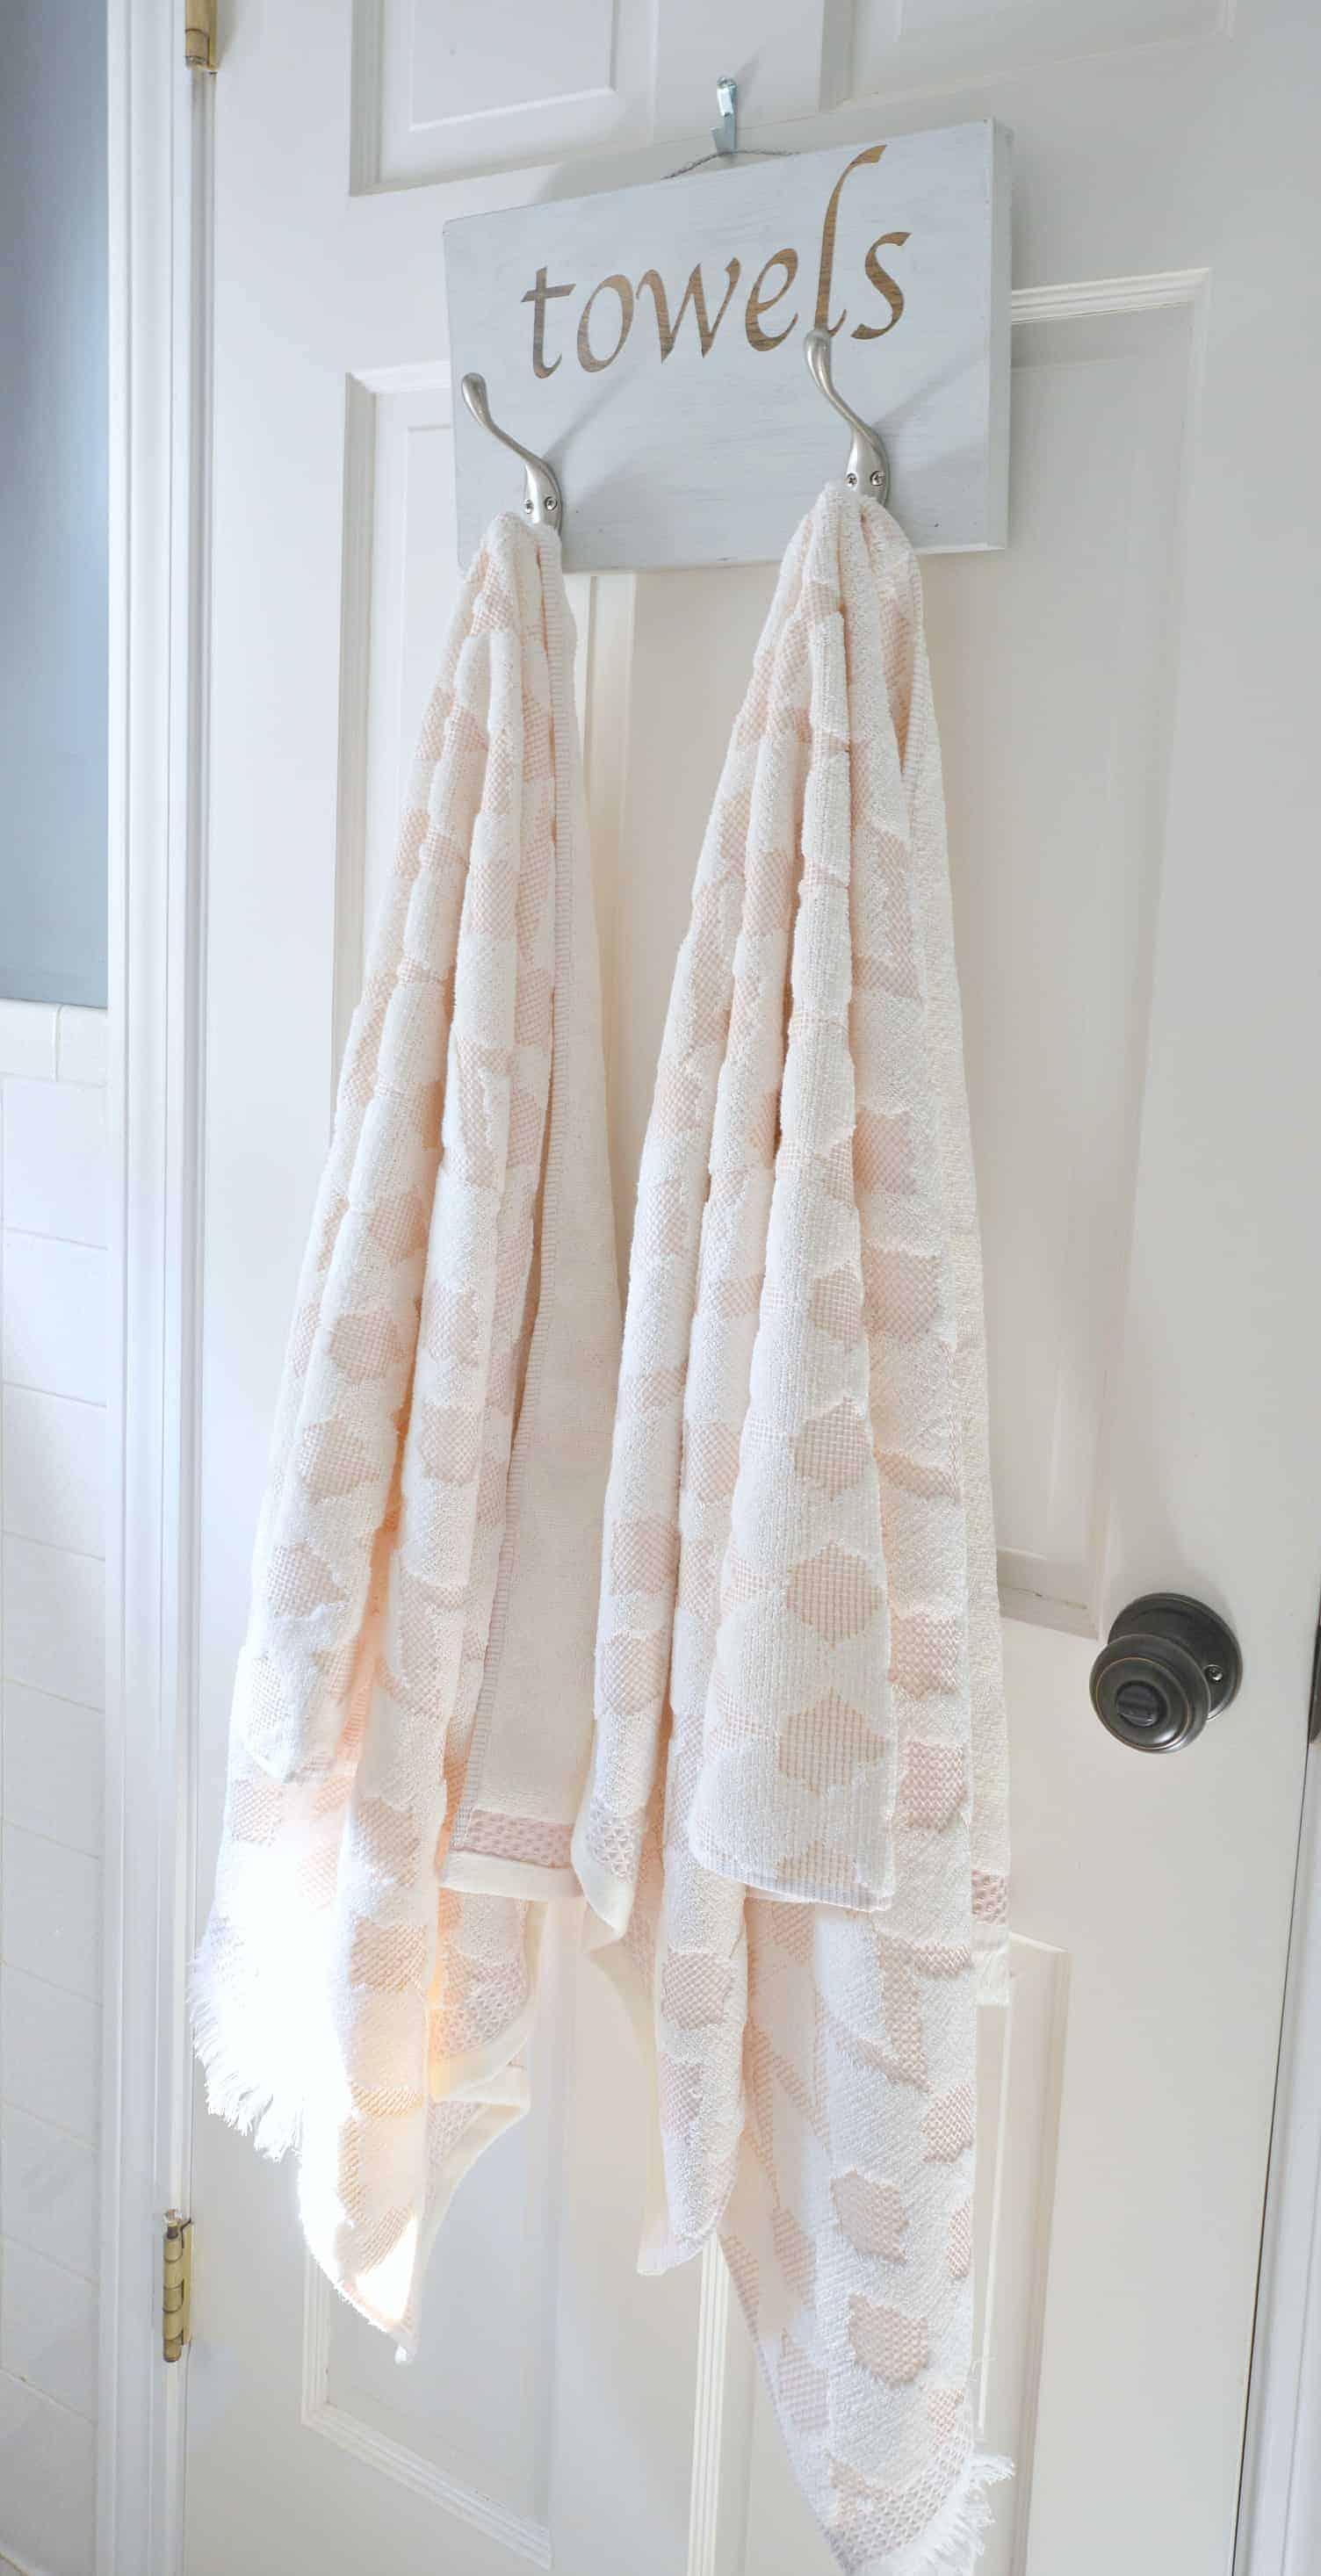 DIY Bathroom Towel Hook Rack - Wife in Progress